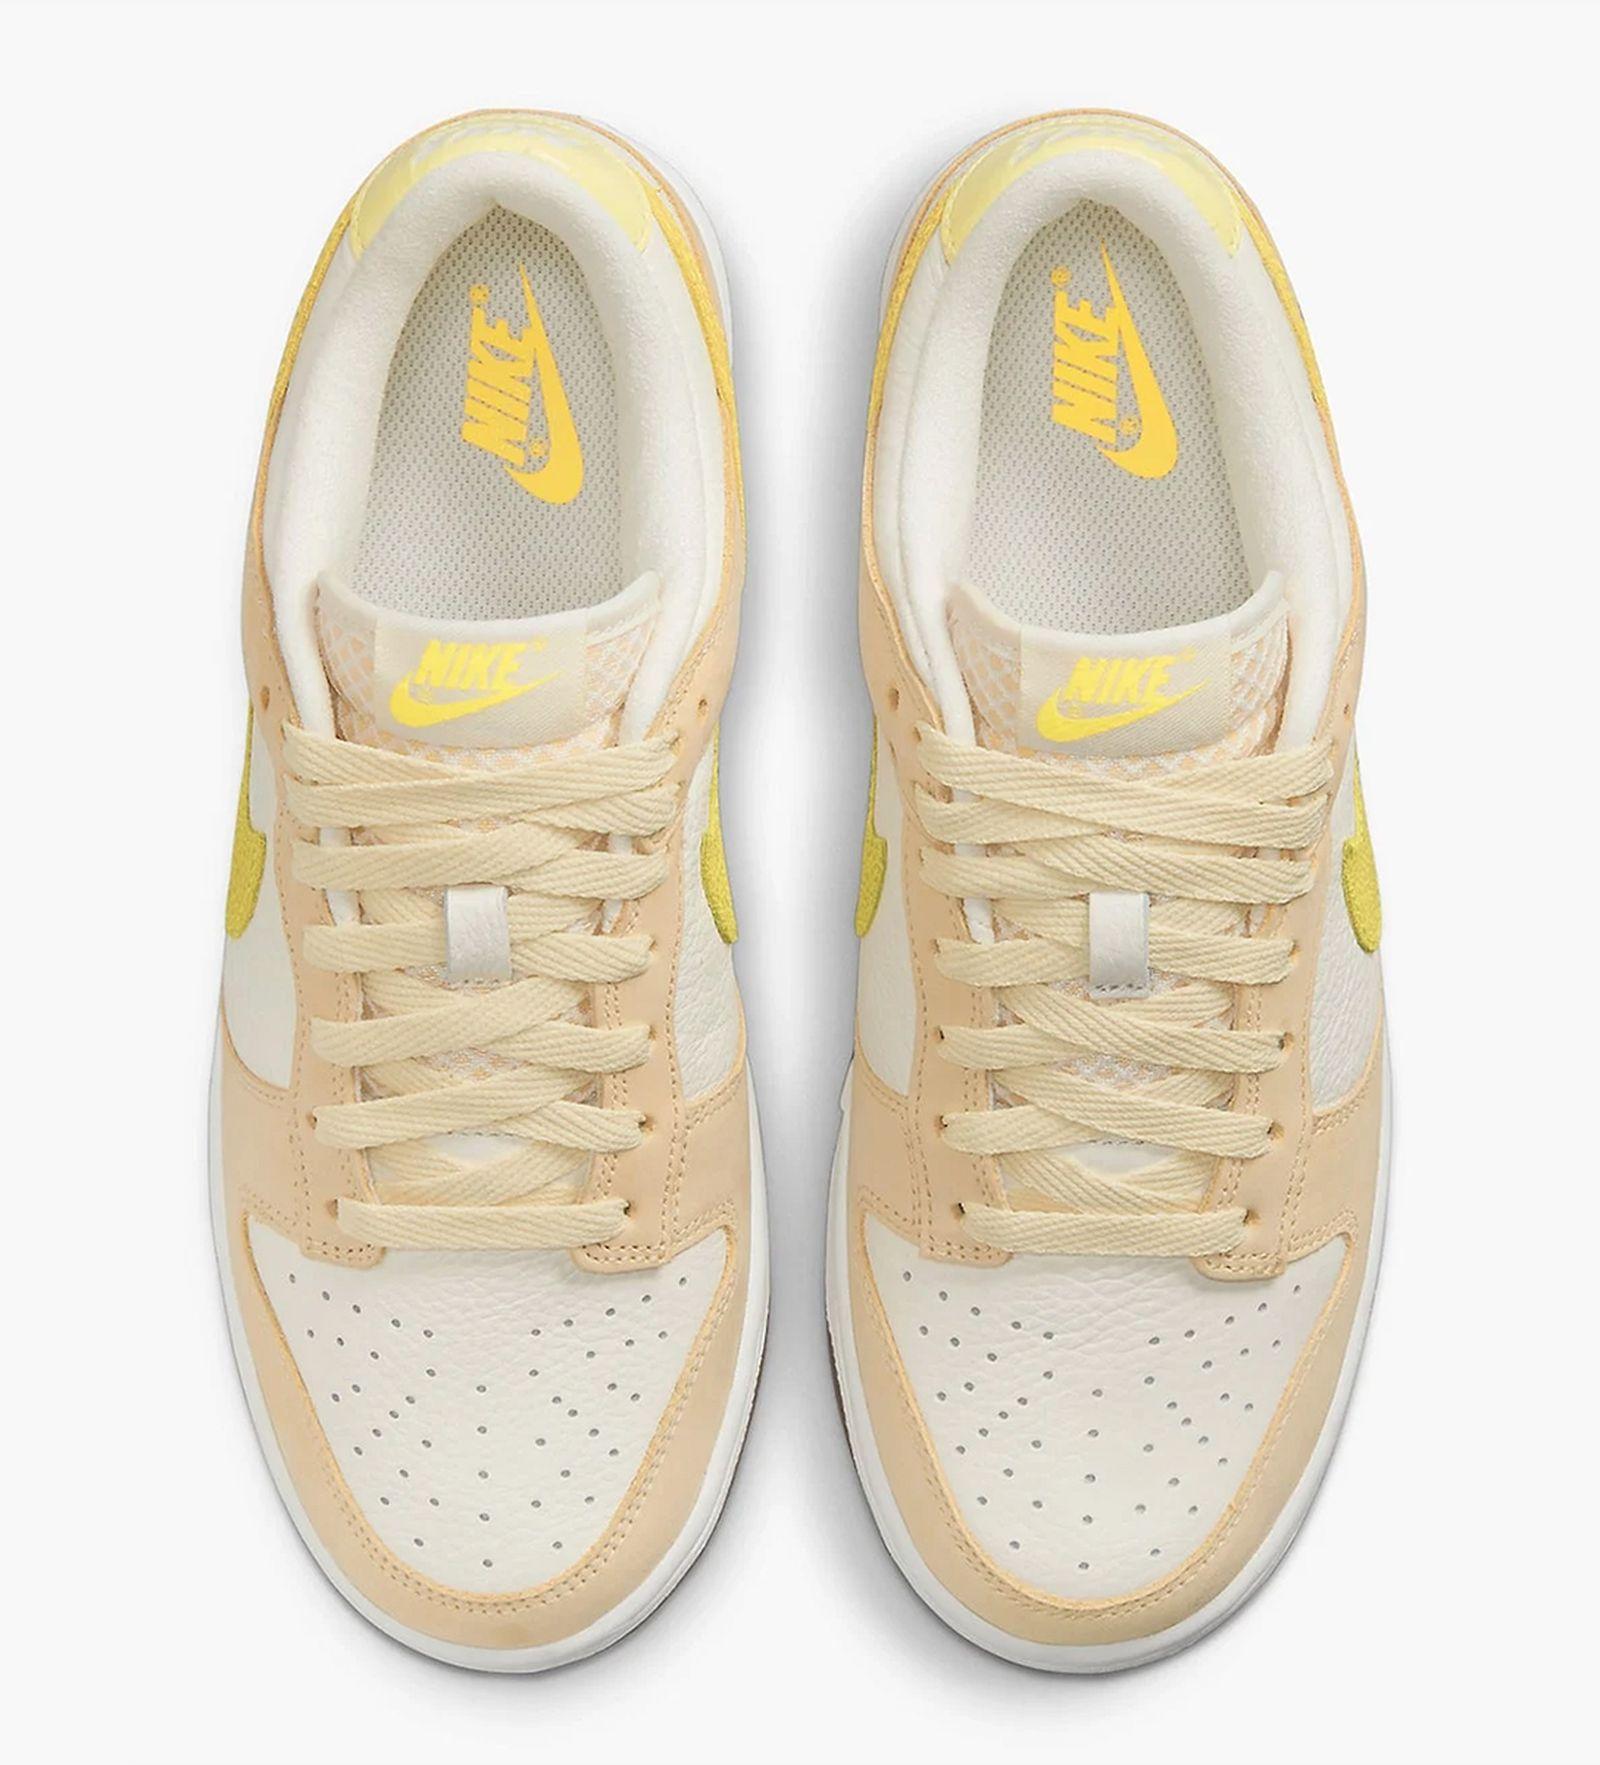 nike-dunk-low-lemon-drop-release-date-price-04